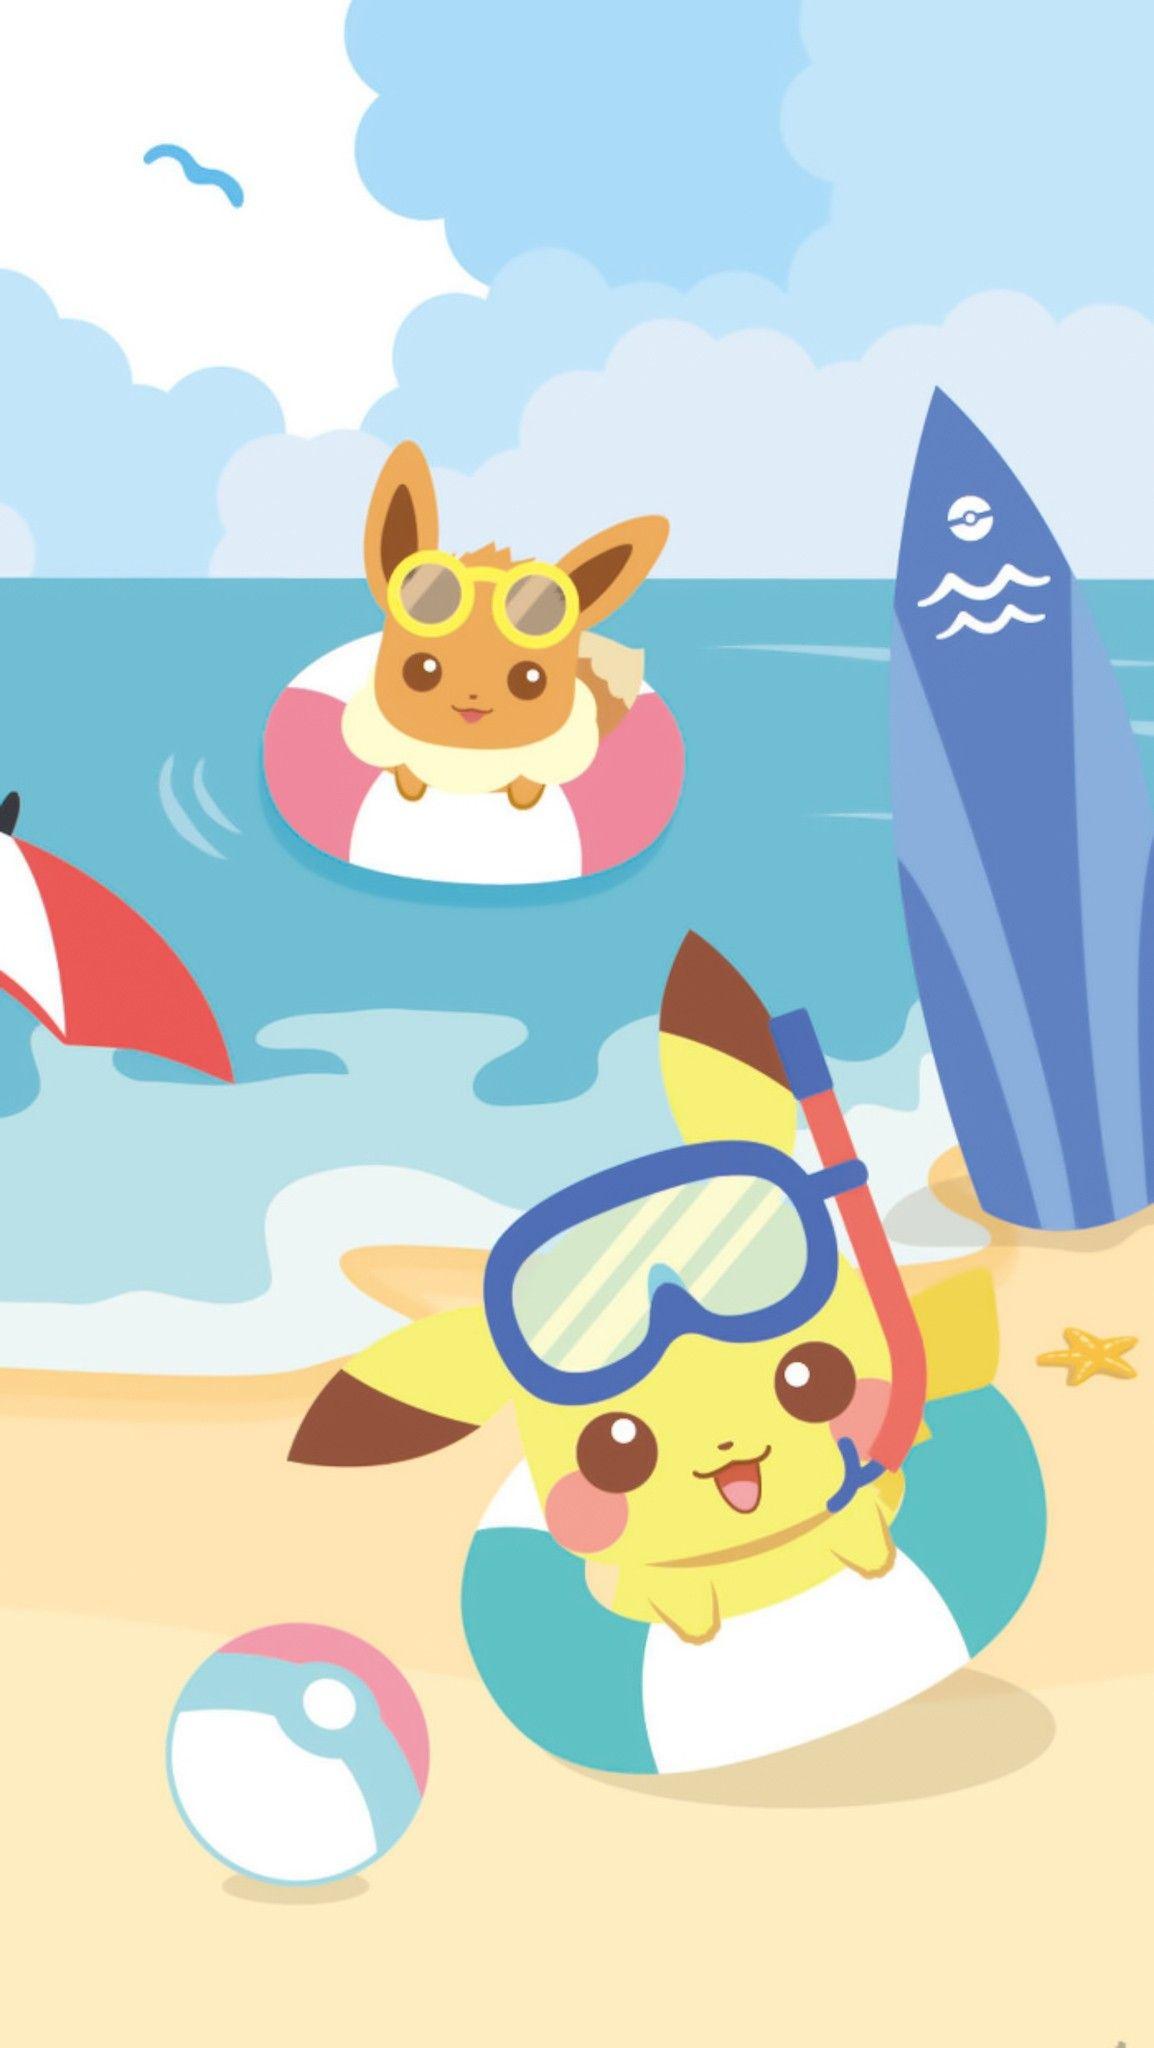 Pin By Aekkalisa On Pokemon Bg Pokemon Umbreon Pikachu Wallpaper Iphone Cute Cartoon Wallpapers